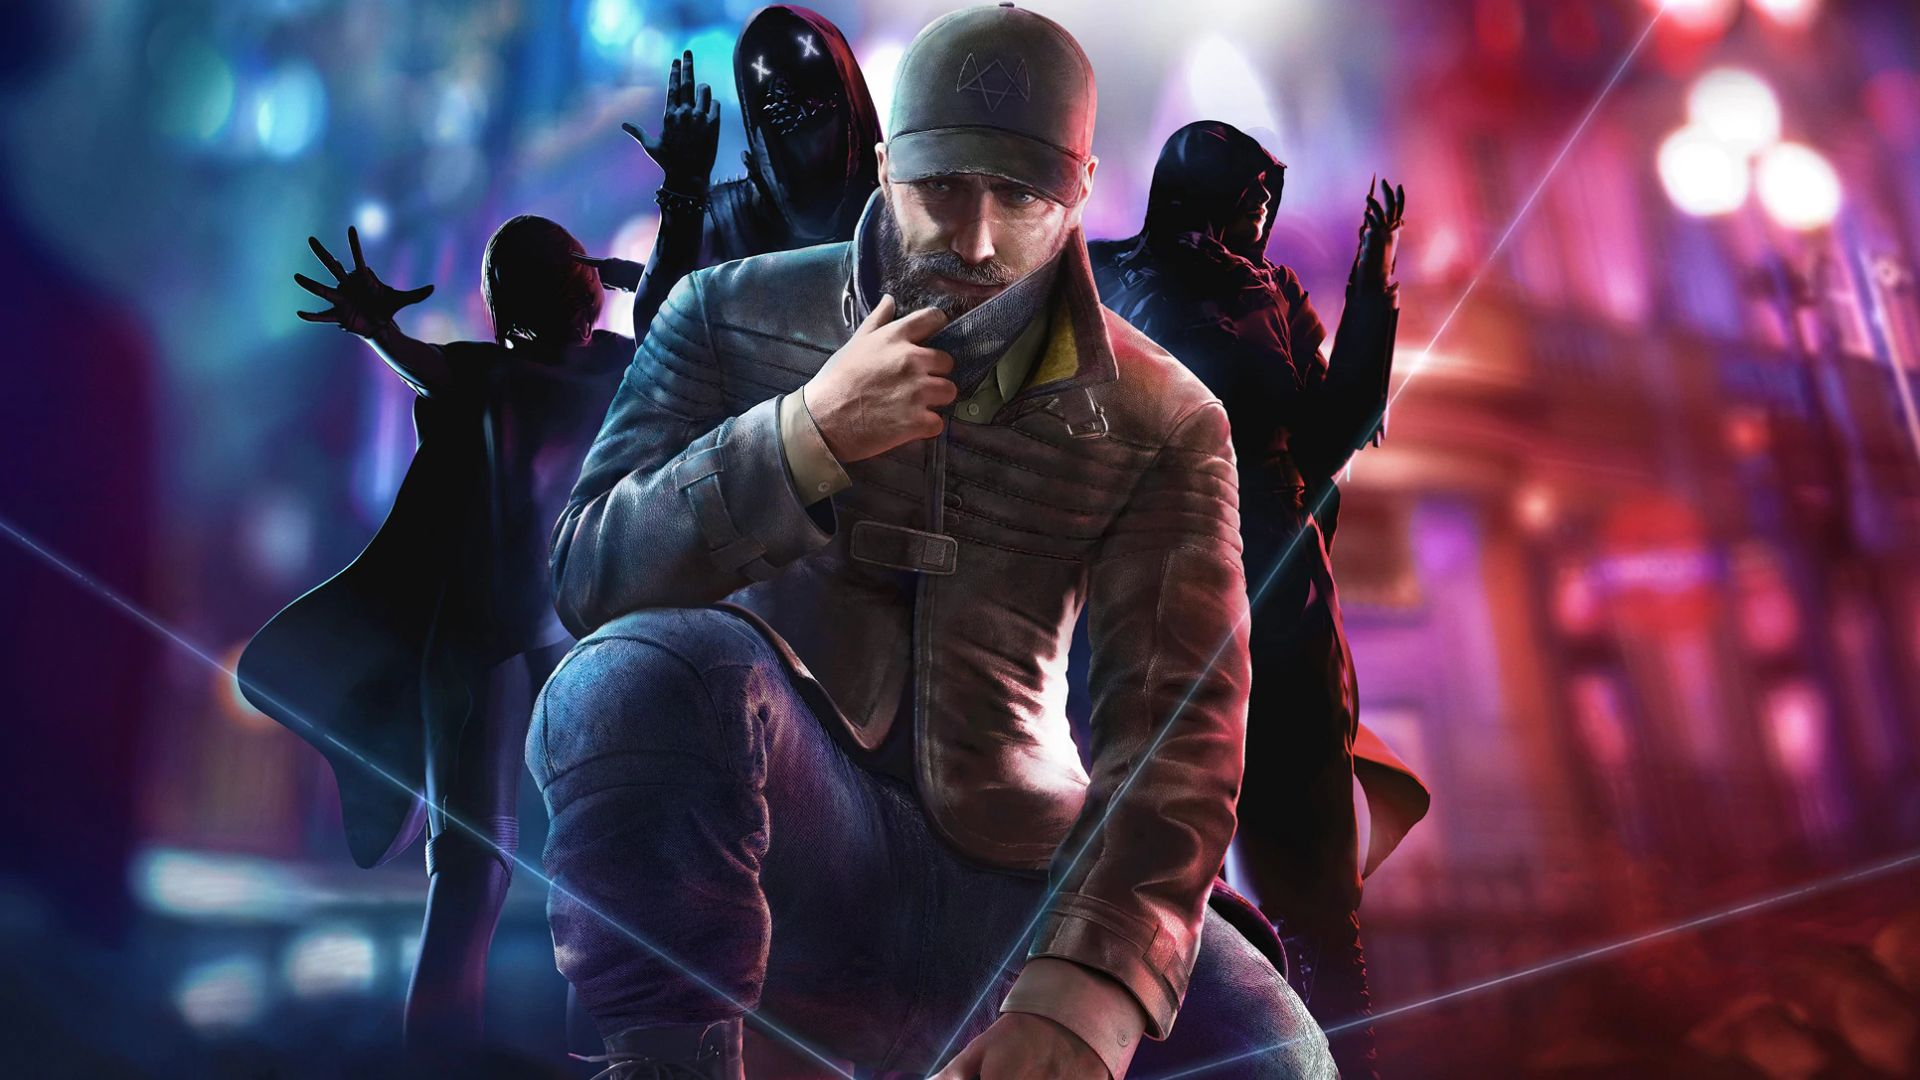 Watch Dogs: Legion – Bloodline Story Trailer Confirmed for Ubisoft Forward